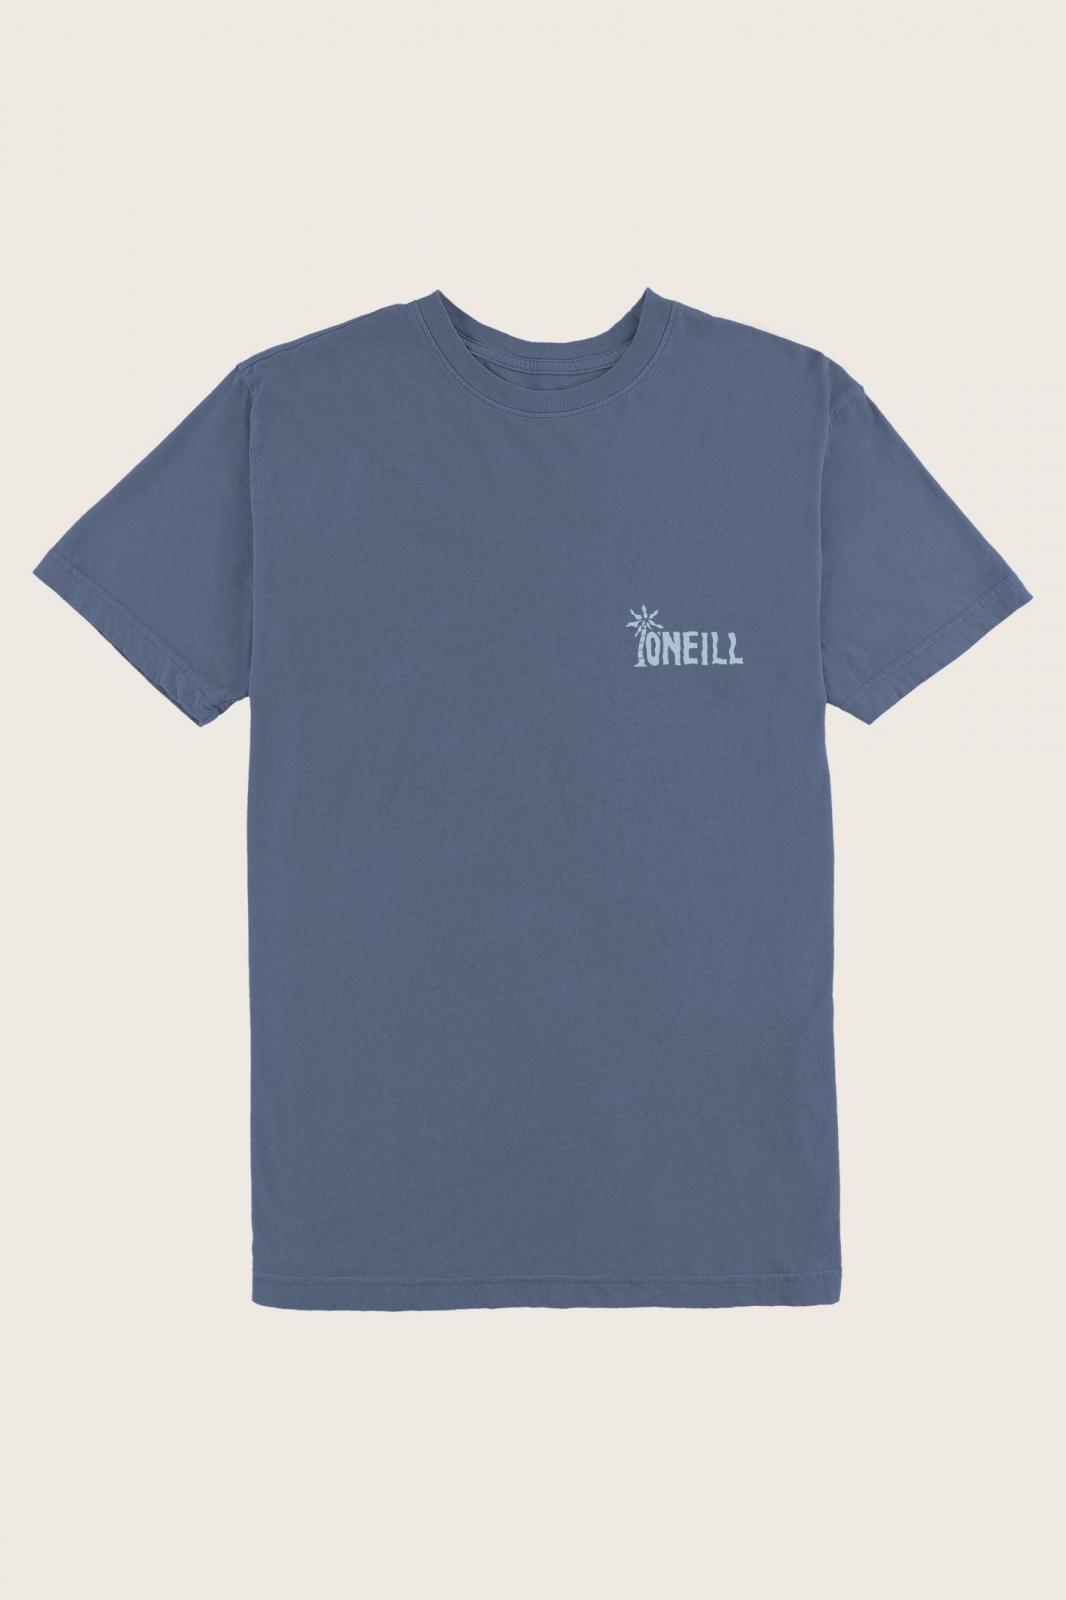 ONEILL TOMBSTONE TEE